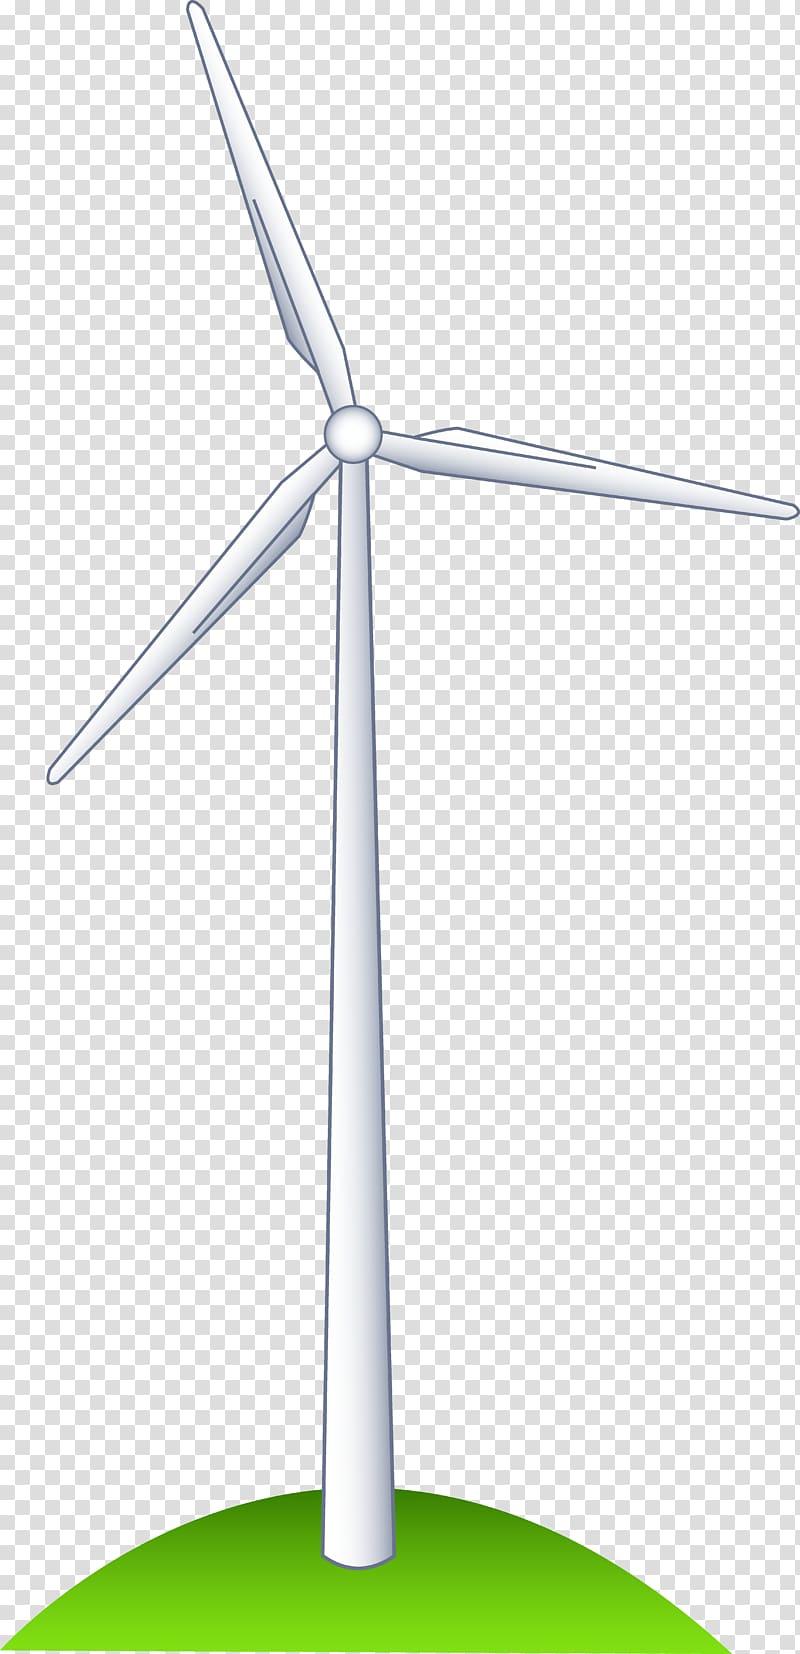 Wind turbine roof clipart clip art black and white library Wind farm Wind turbine Windmill Wind power , wind ... clip art black and white library